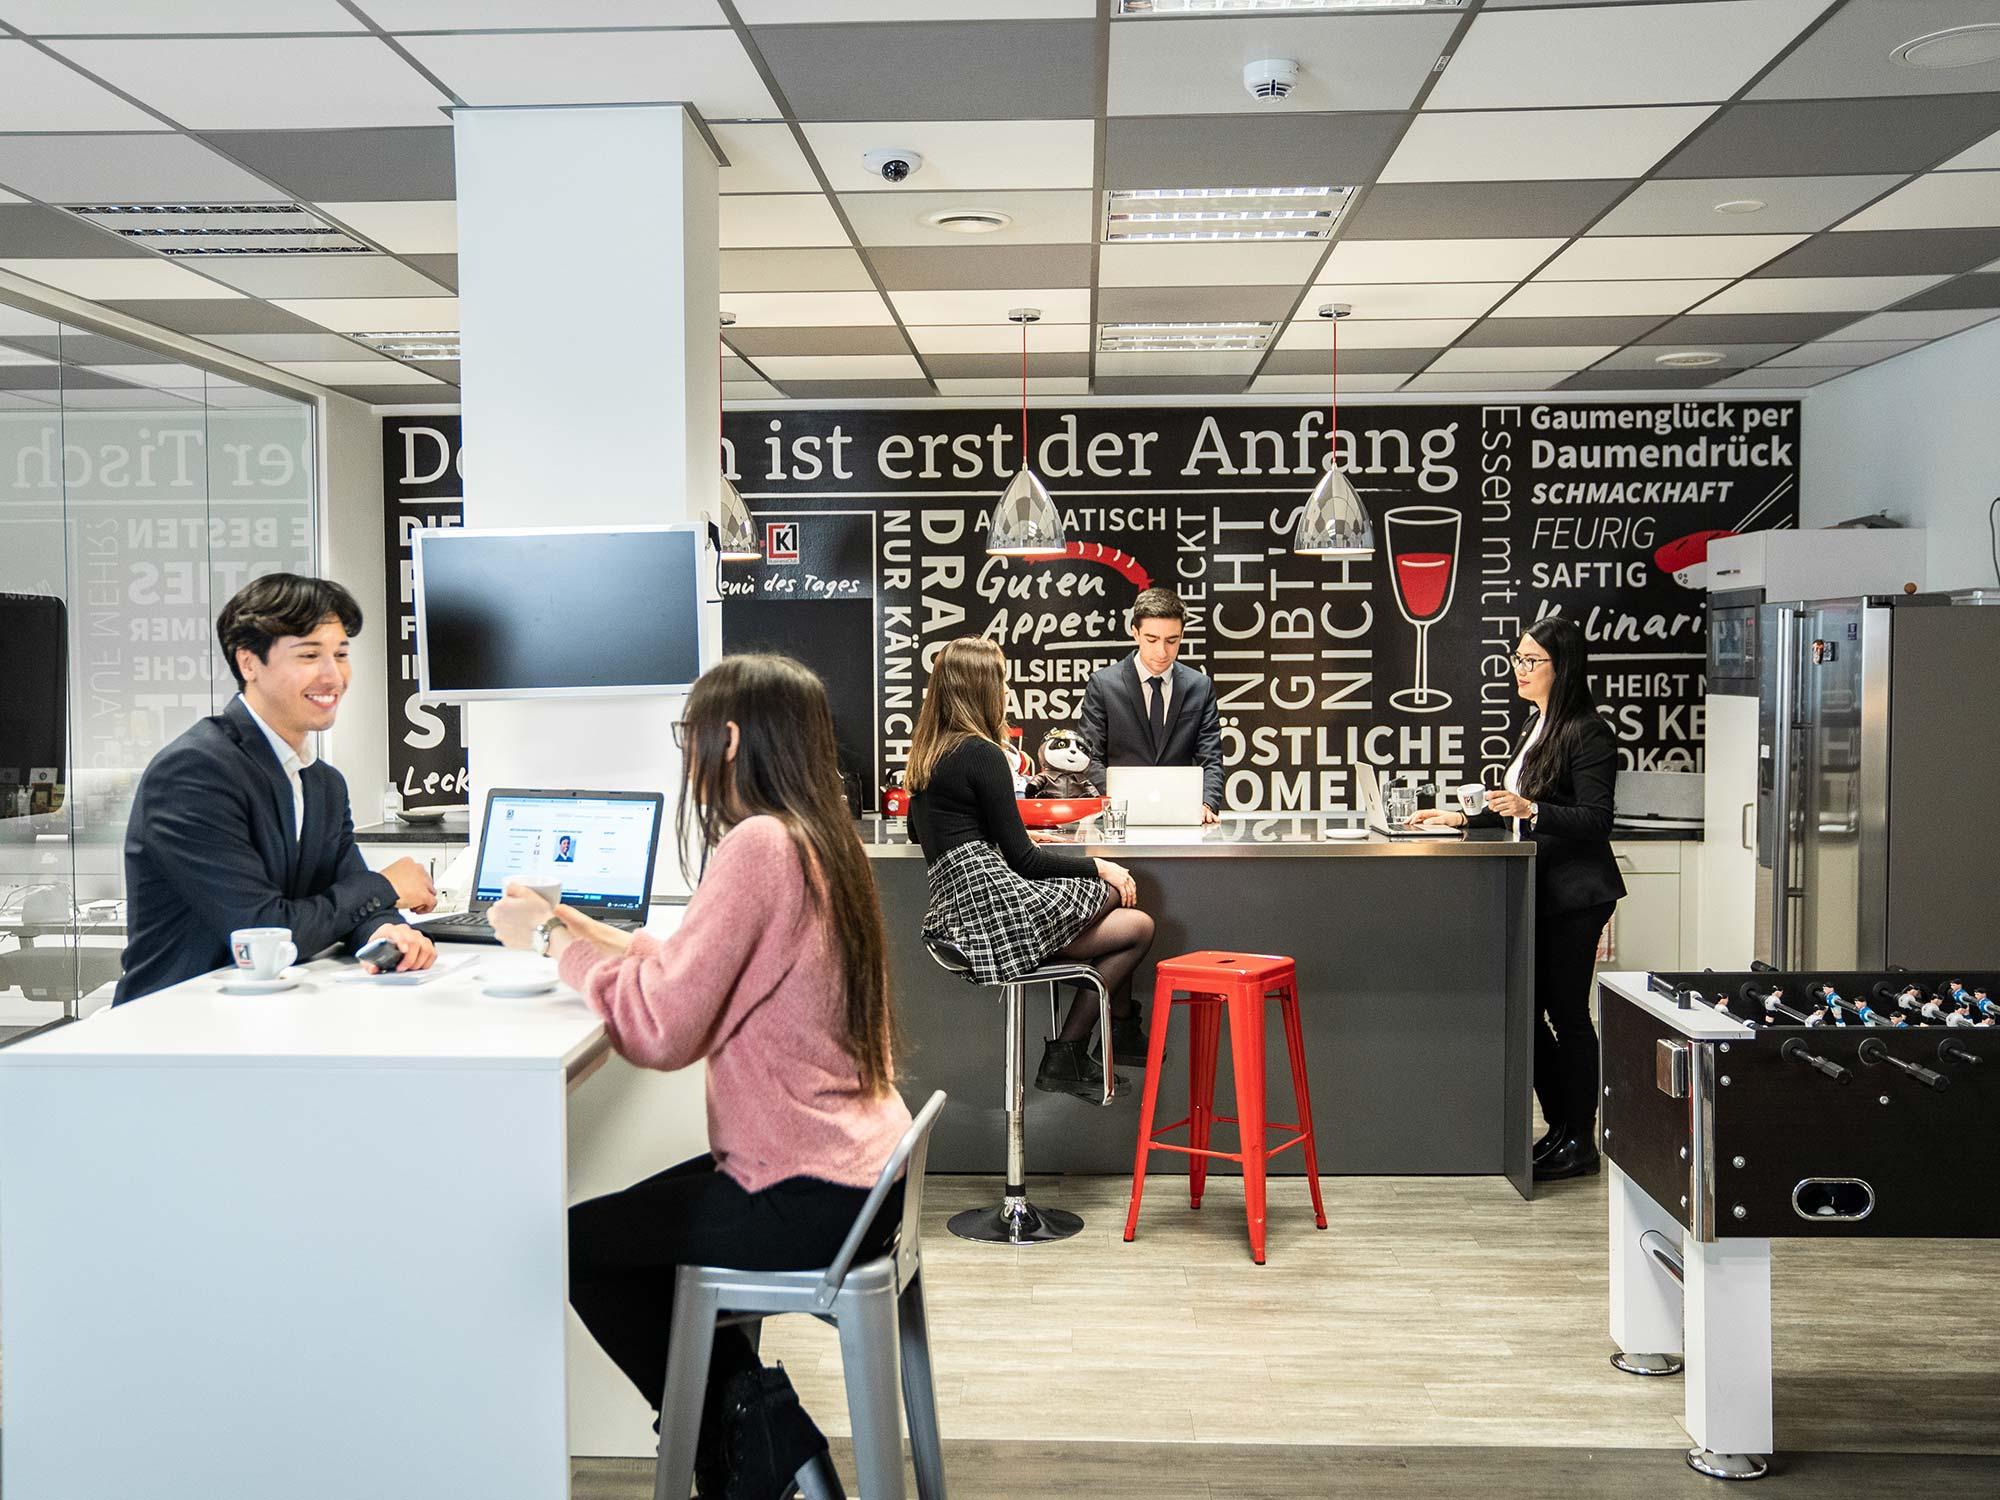 K1 Businessclub Frankfurt - K 1 Frankfurt am Main - Coworking Frankfurt - Büros zur Miete - Kurzzeitmiete